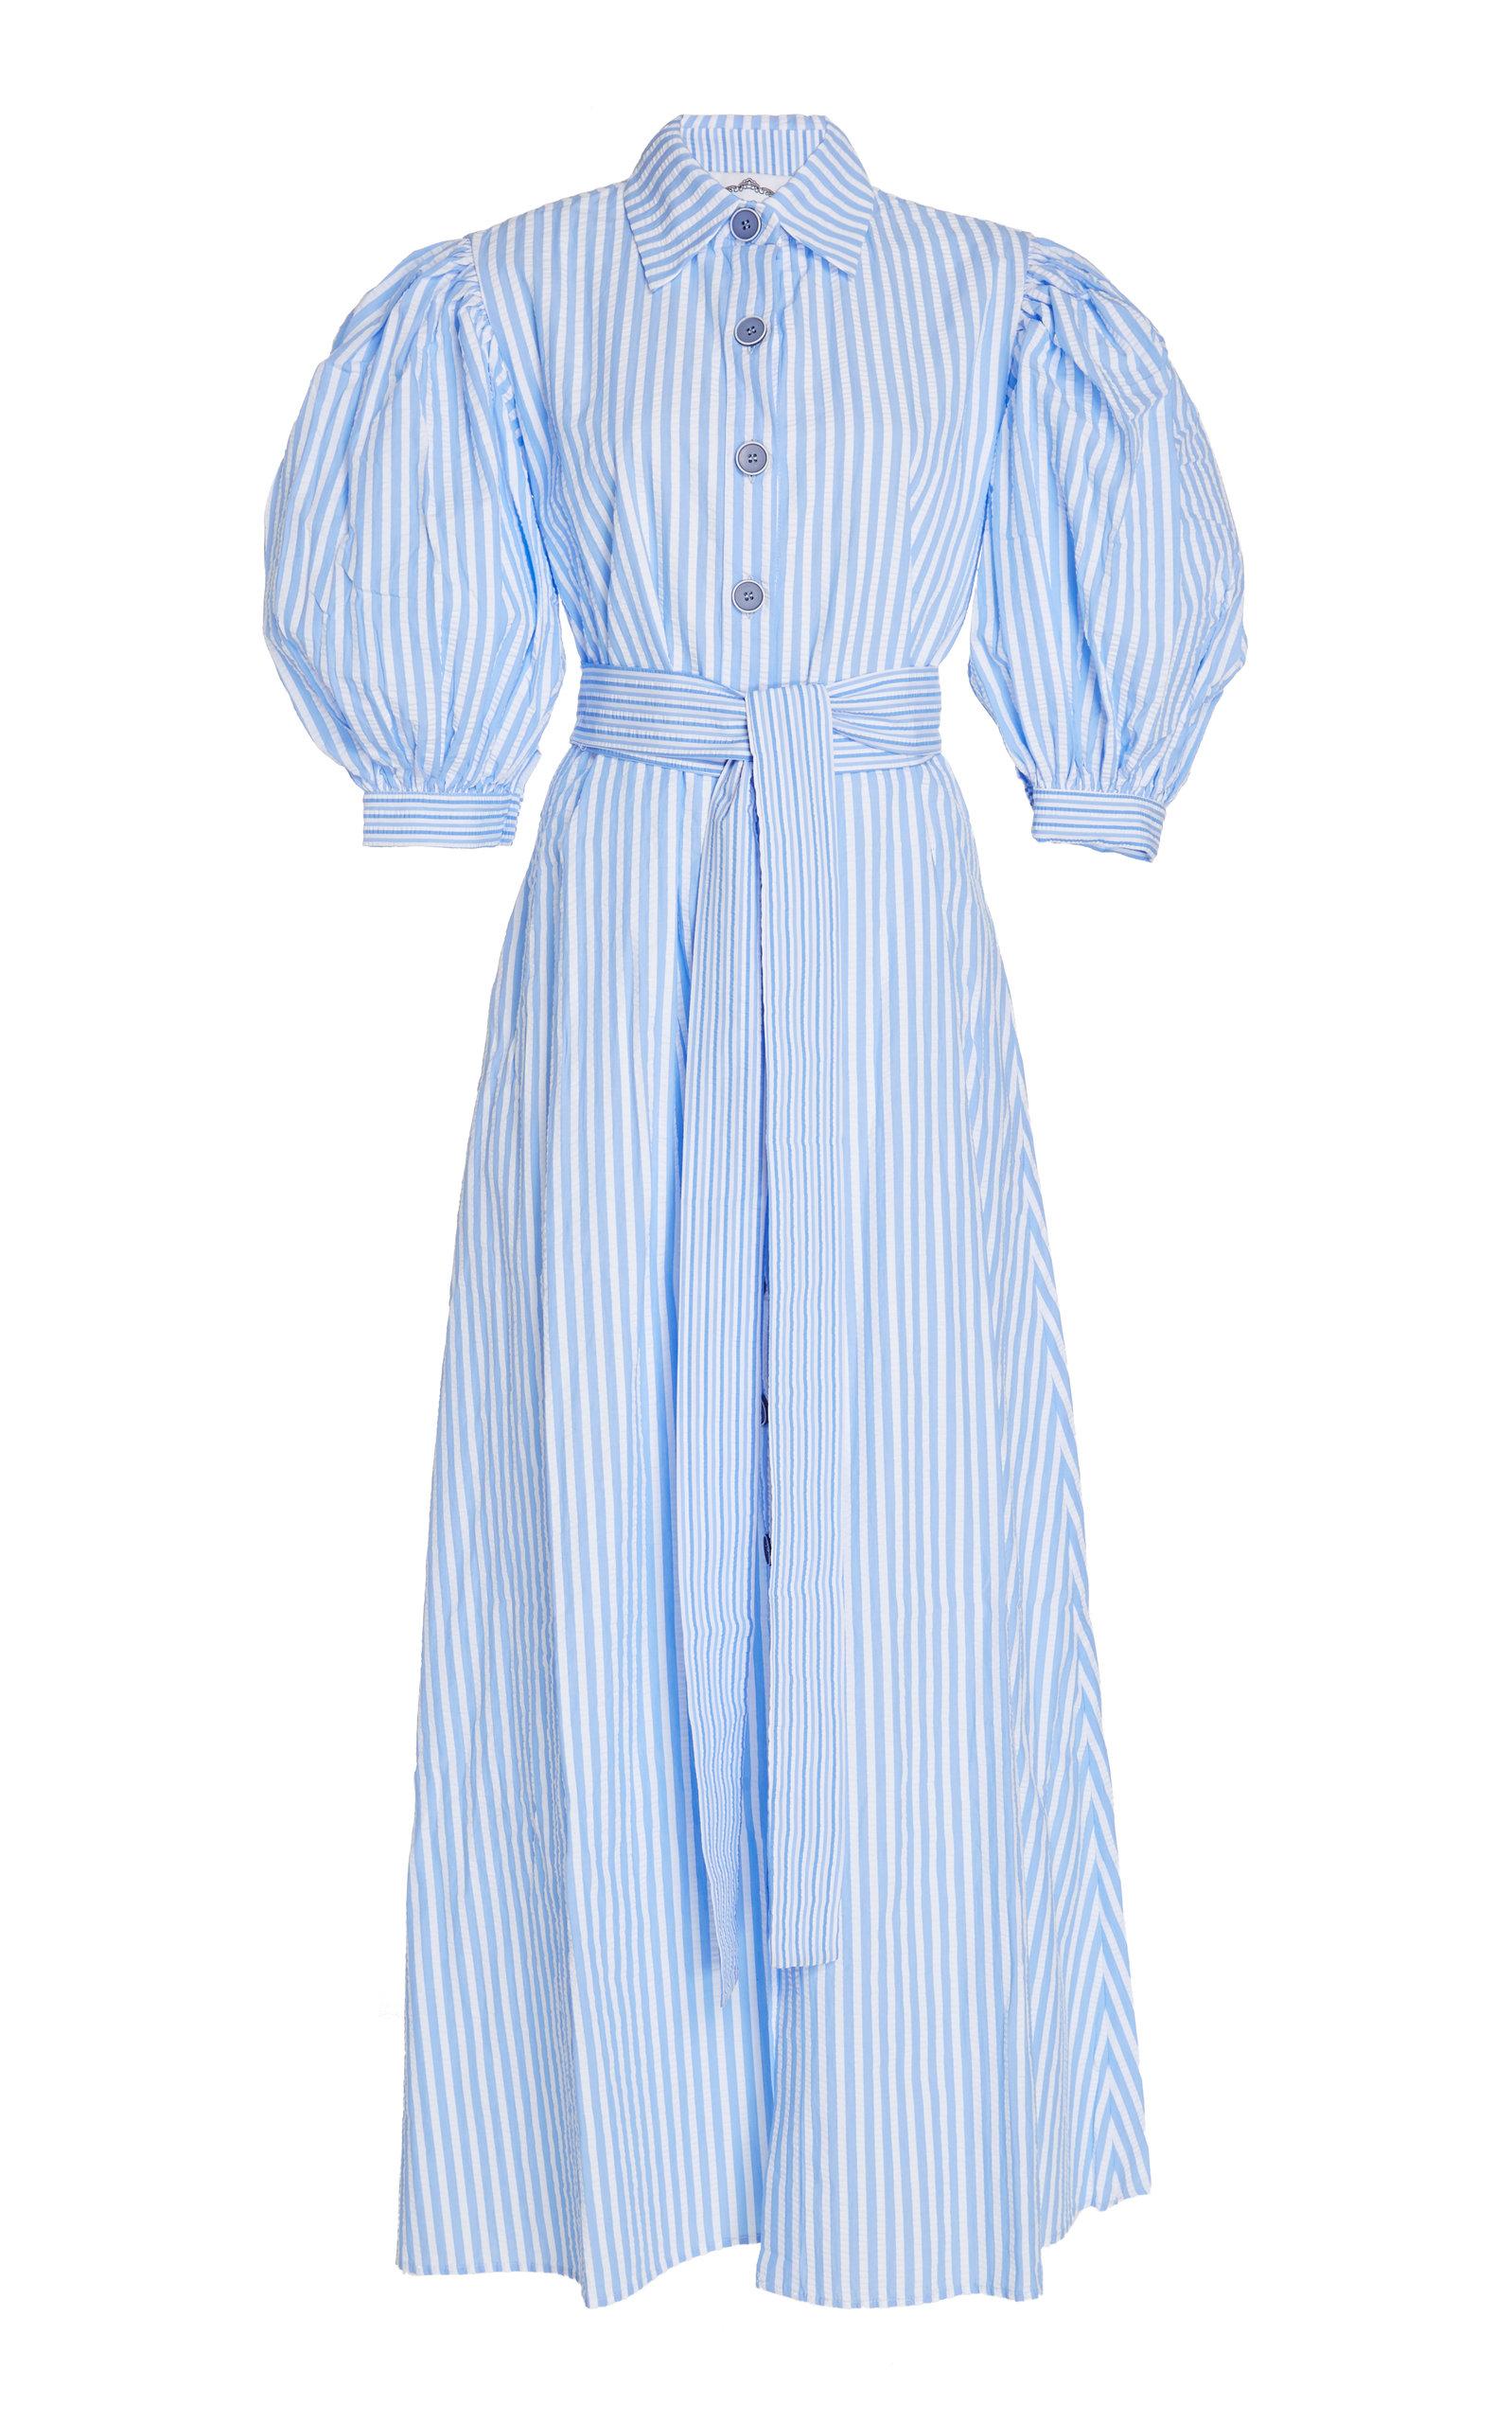 89adaab63b71 Valerie Puff-Sleeve Striped Cotton Maxi Dress by Evi Grintela